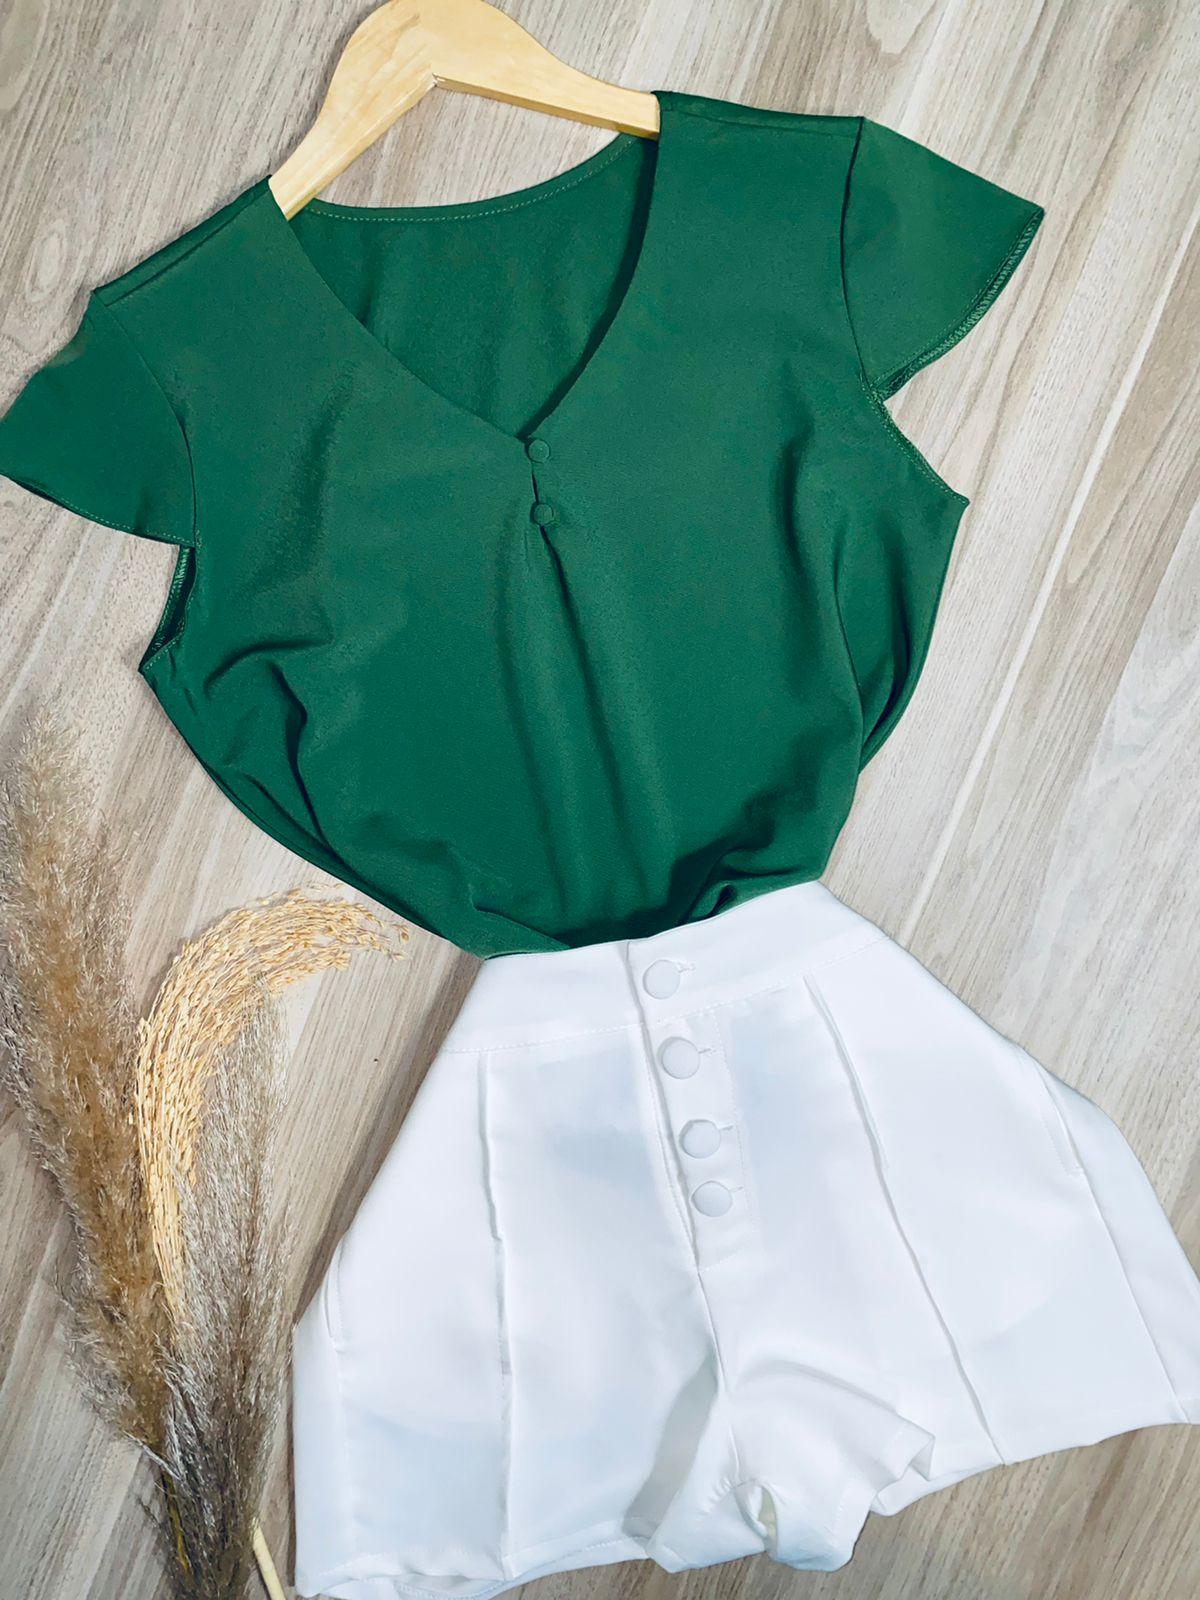 Blusa Manga Curta Fashion Verde